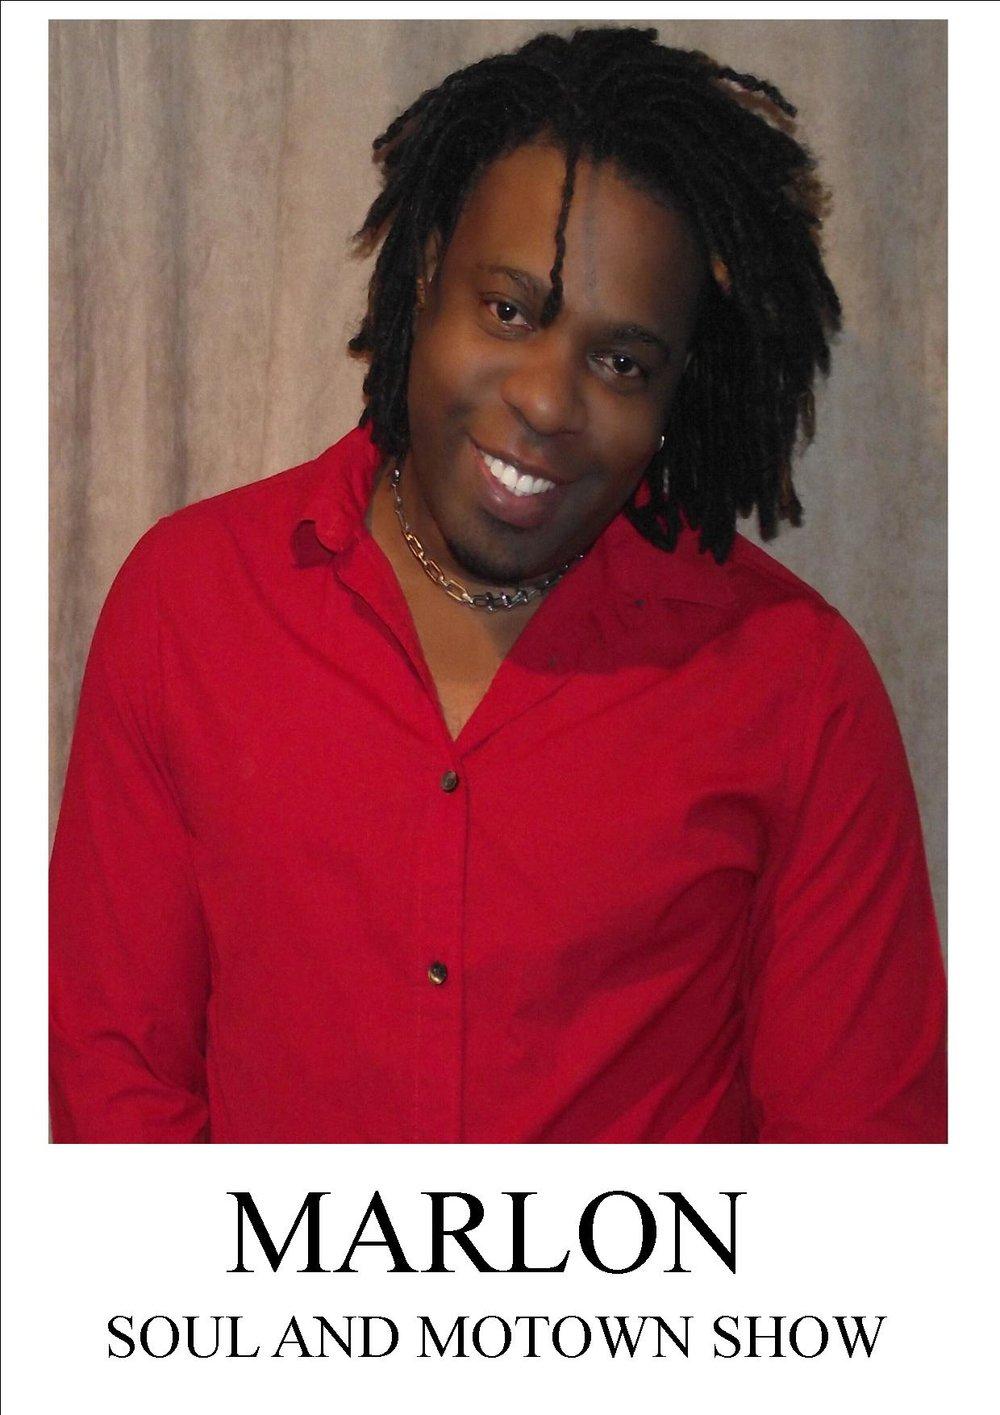 MARLON POSTER.jpg